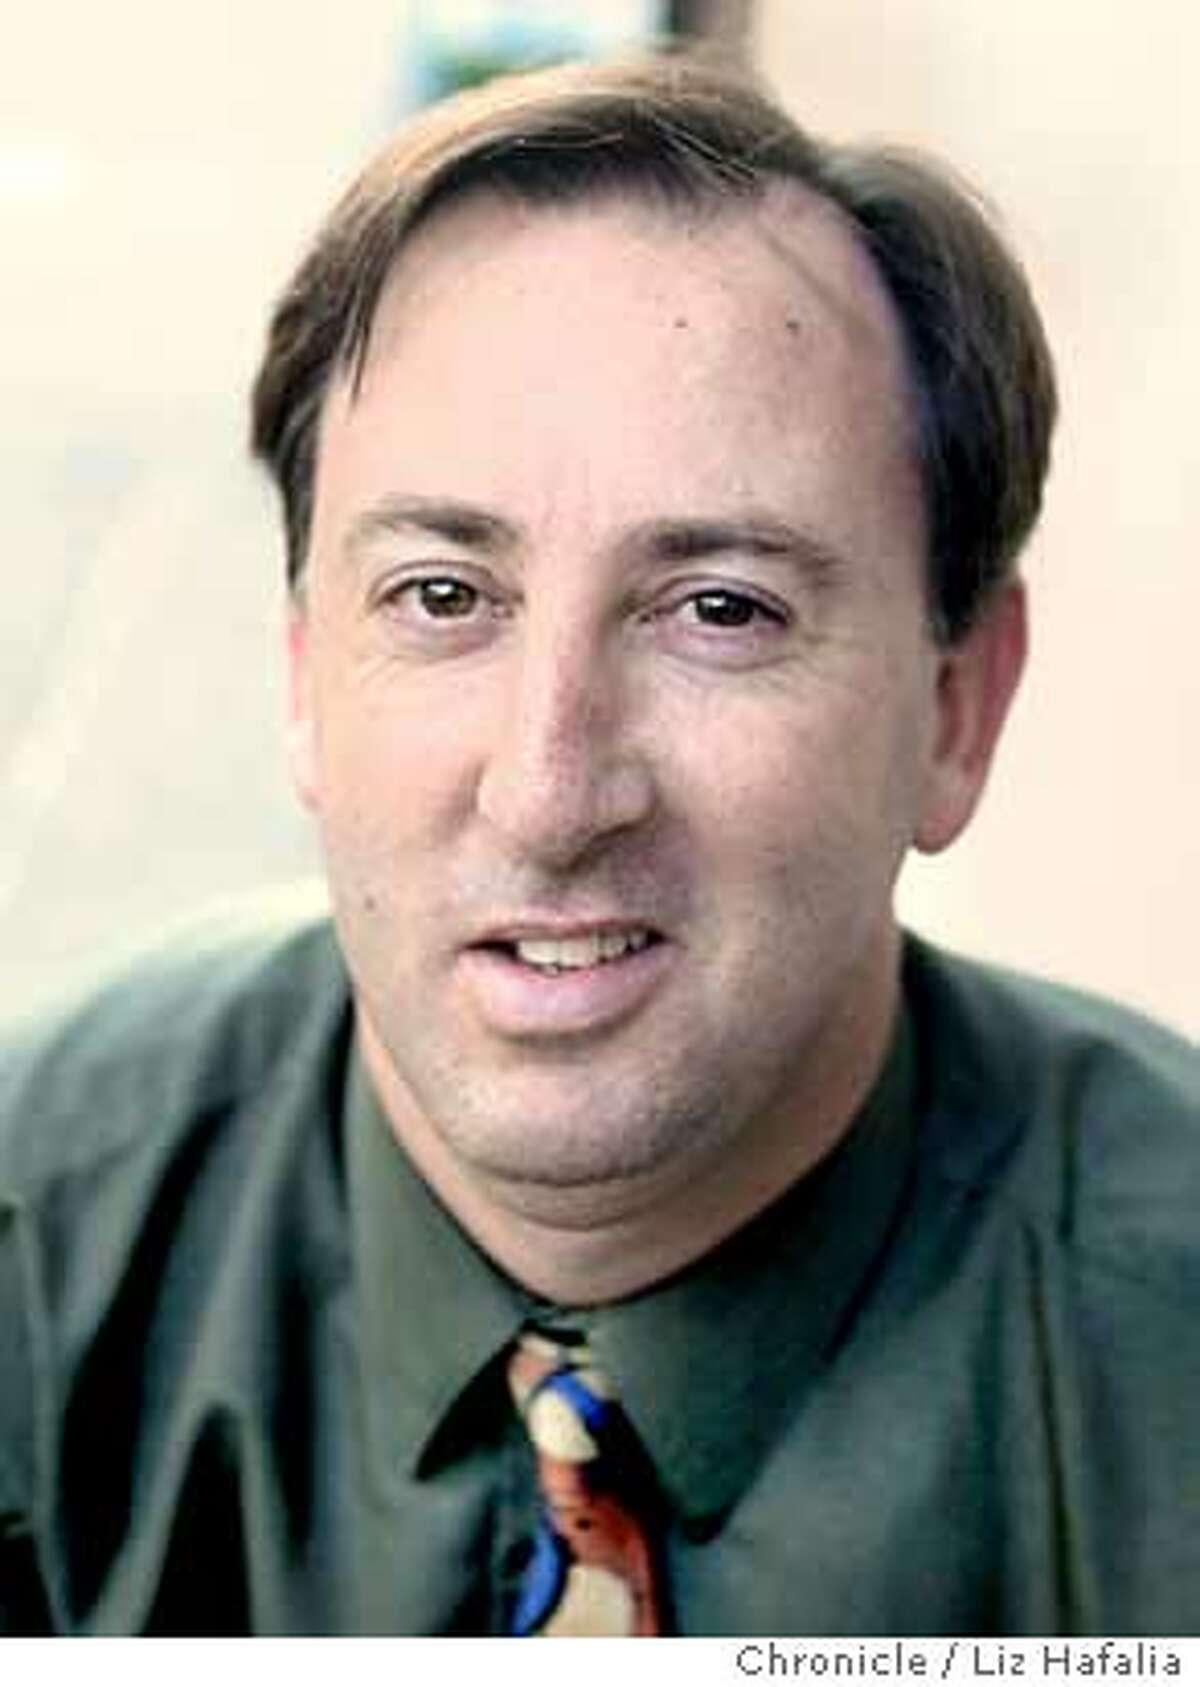 Mug of chronicle reporter Mark Fainaru-Wada. Photo taken in San Francisco on 10/8/04, CA. by LIZ HAFALIA / San Francisco Chronicle